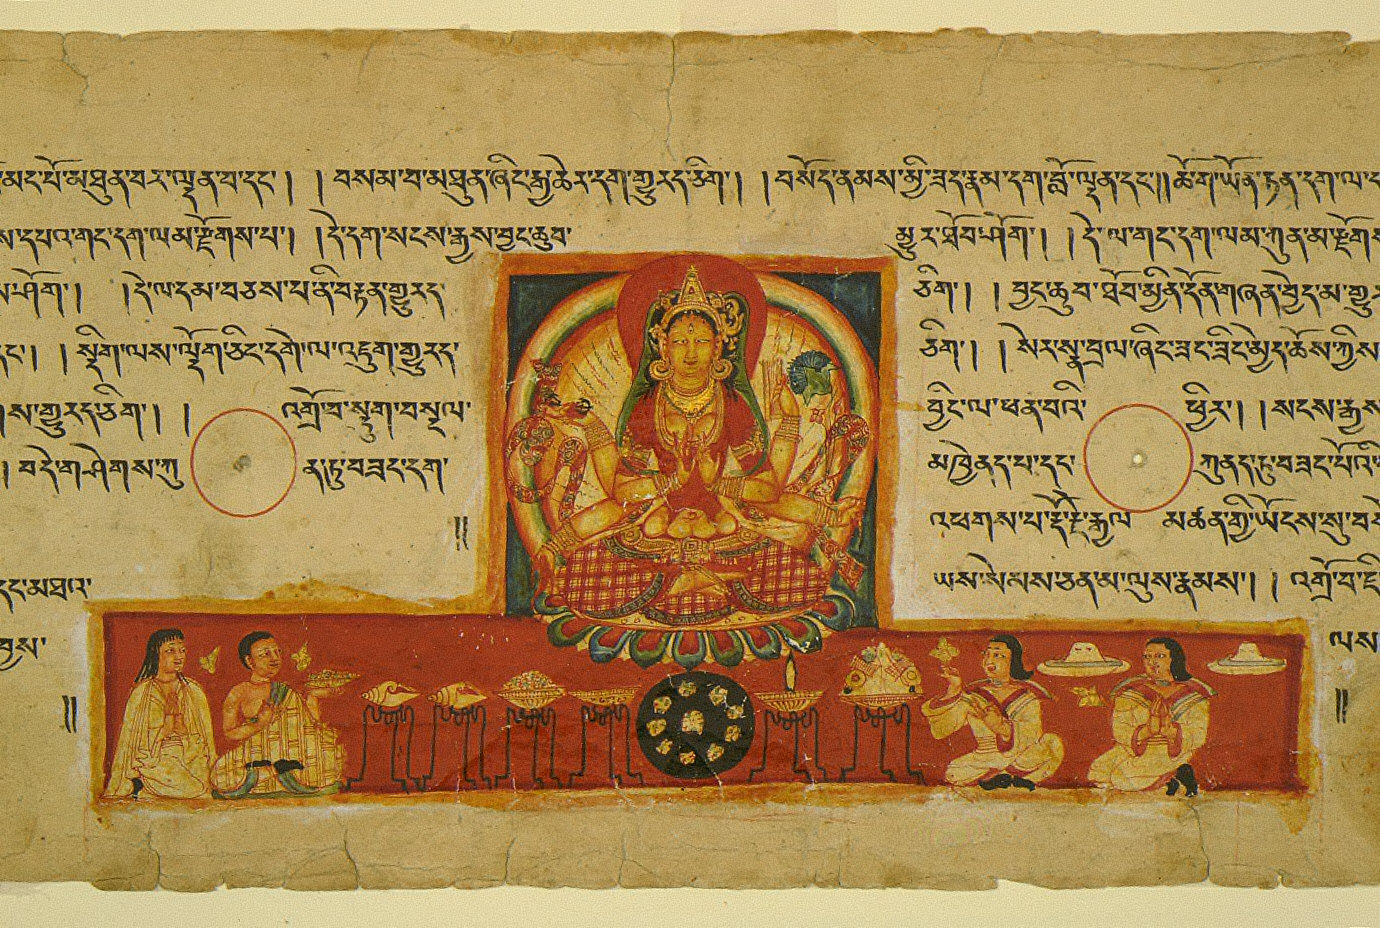 Prajnaparamita with Devotees (Perfection of Wisdom in 8,000 Verses) Folio from an Ashtasahasrika